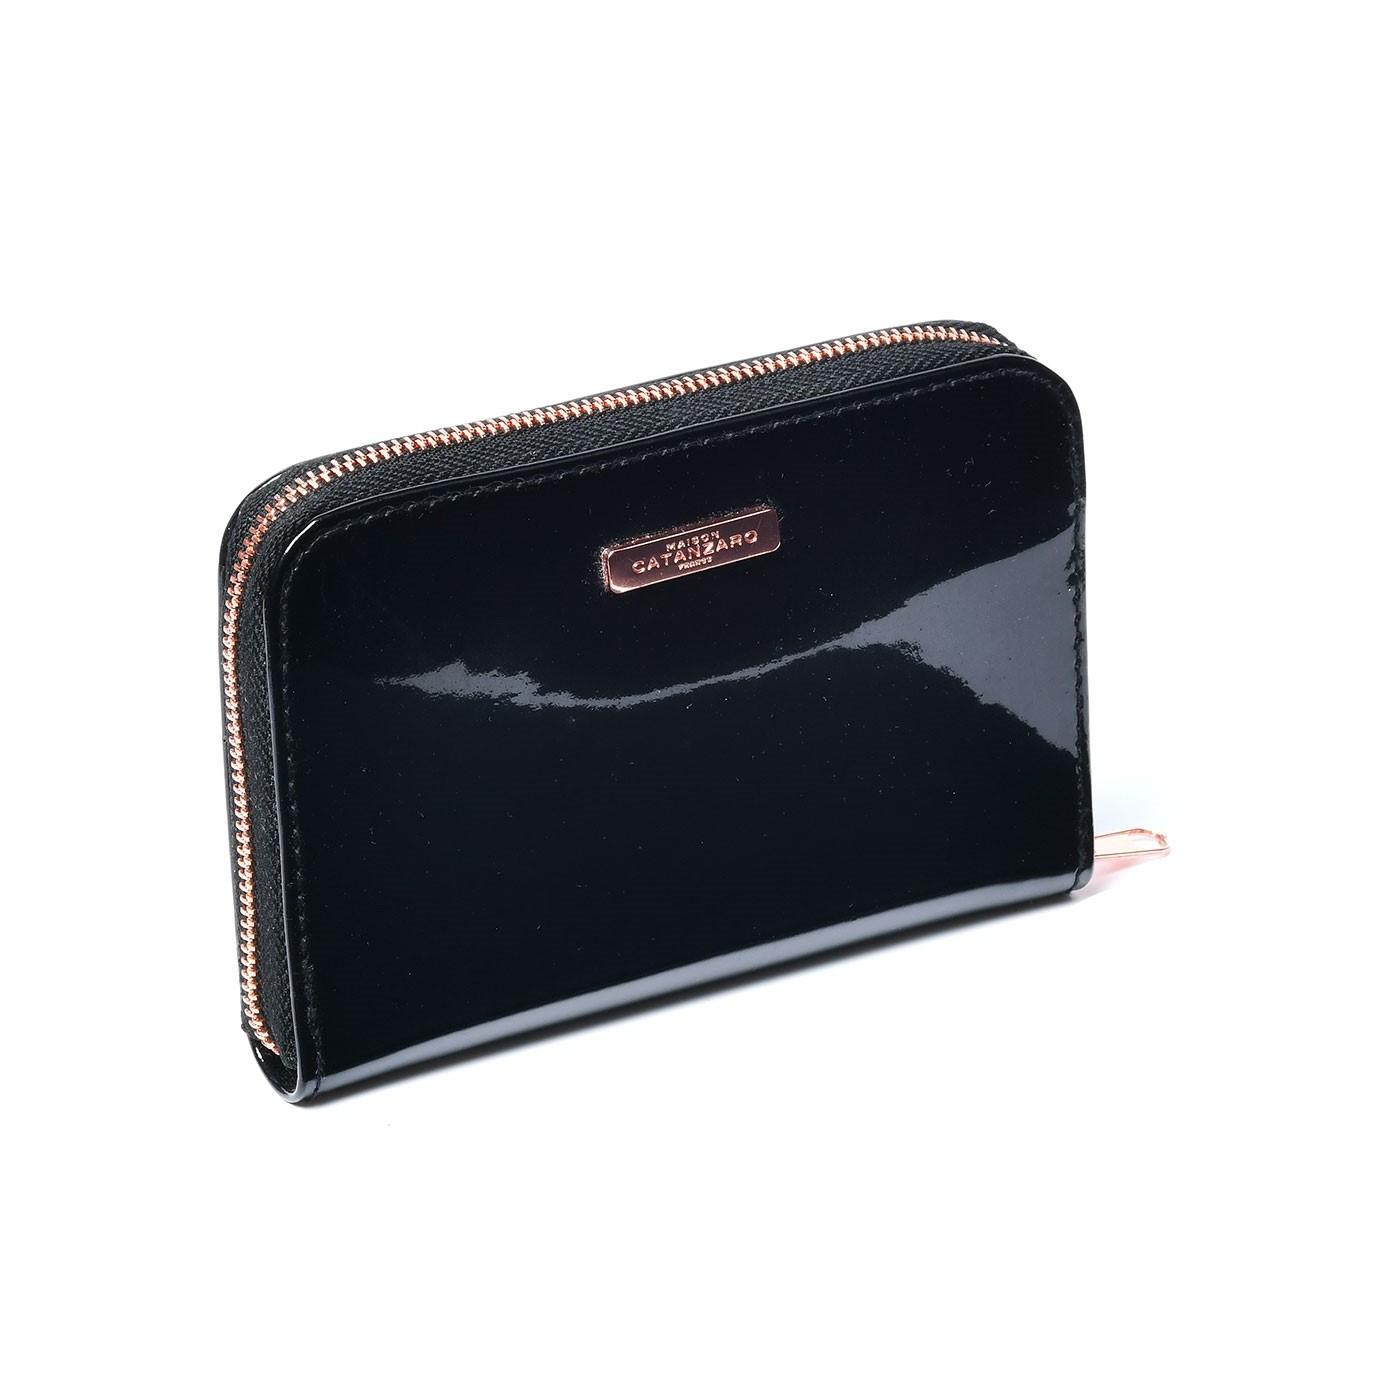 My Little Wallet, vinyl wallet - Maison Catanzaro